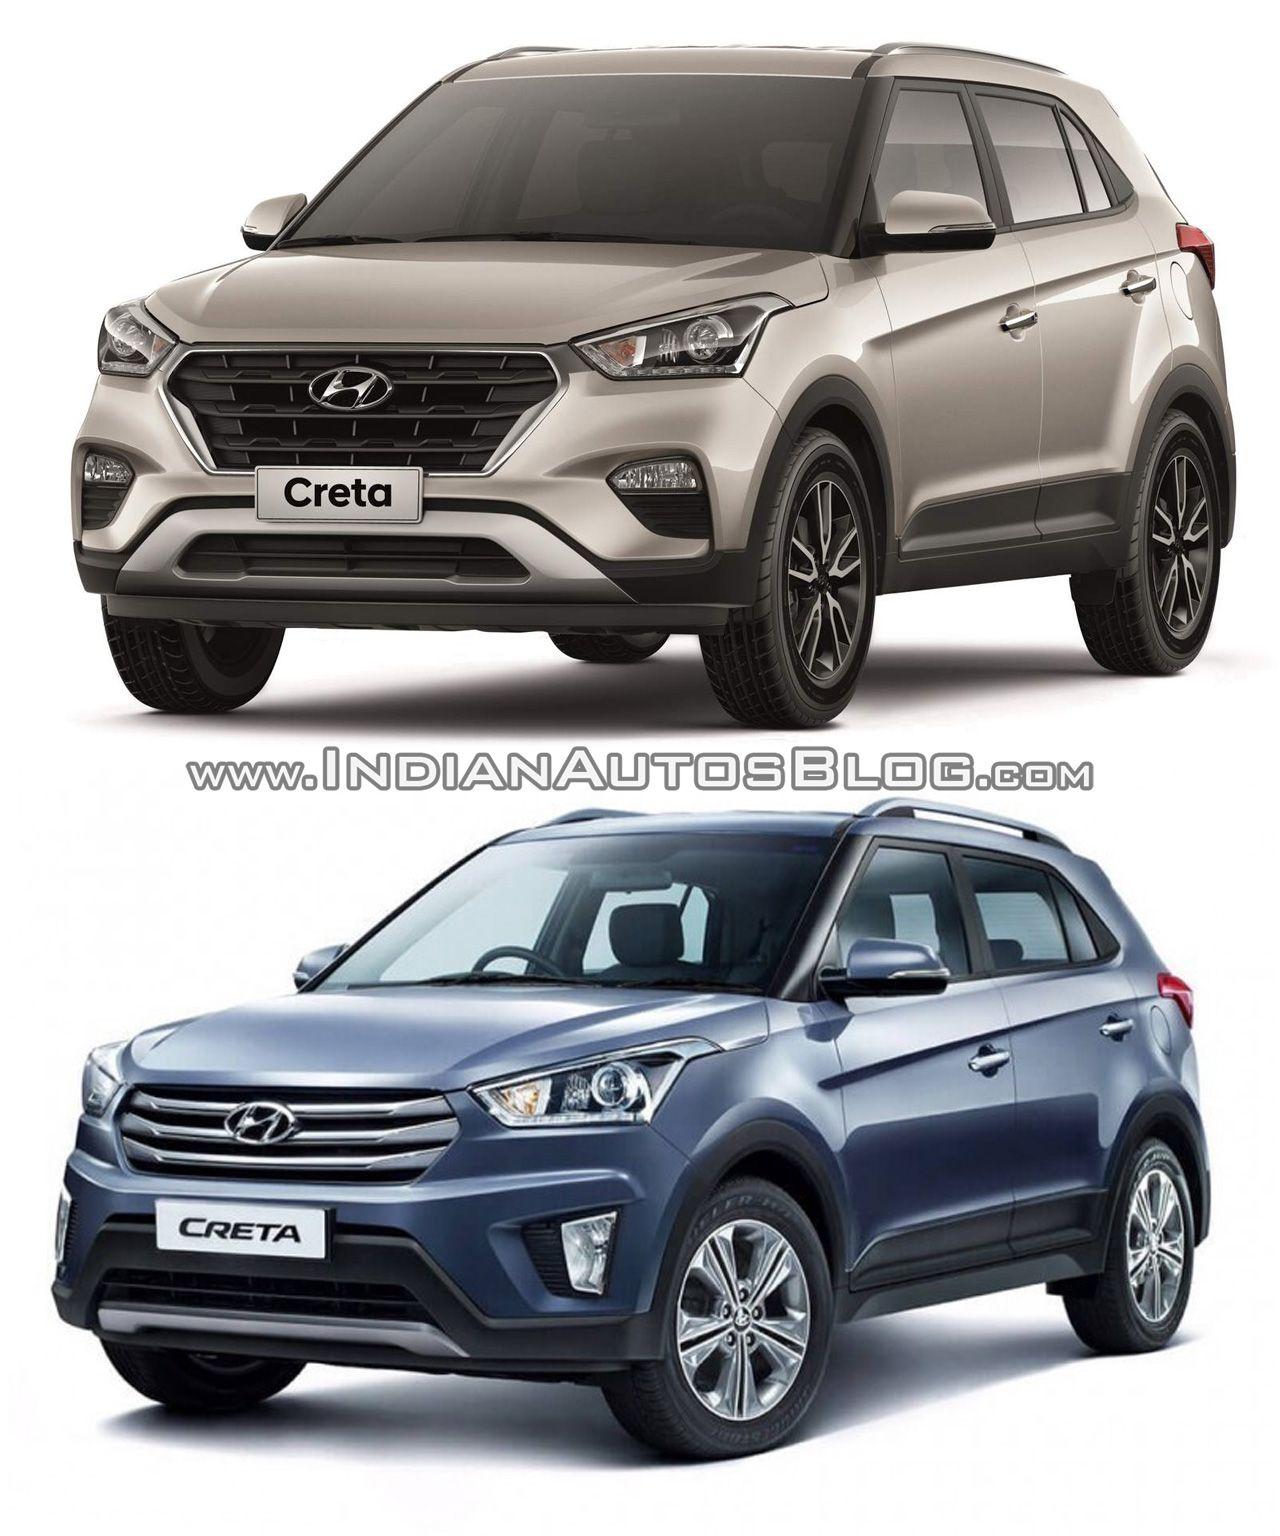 2017 Hyundai Creta vs. 2015 Hyundai Creta - Old vs. New | Cars